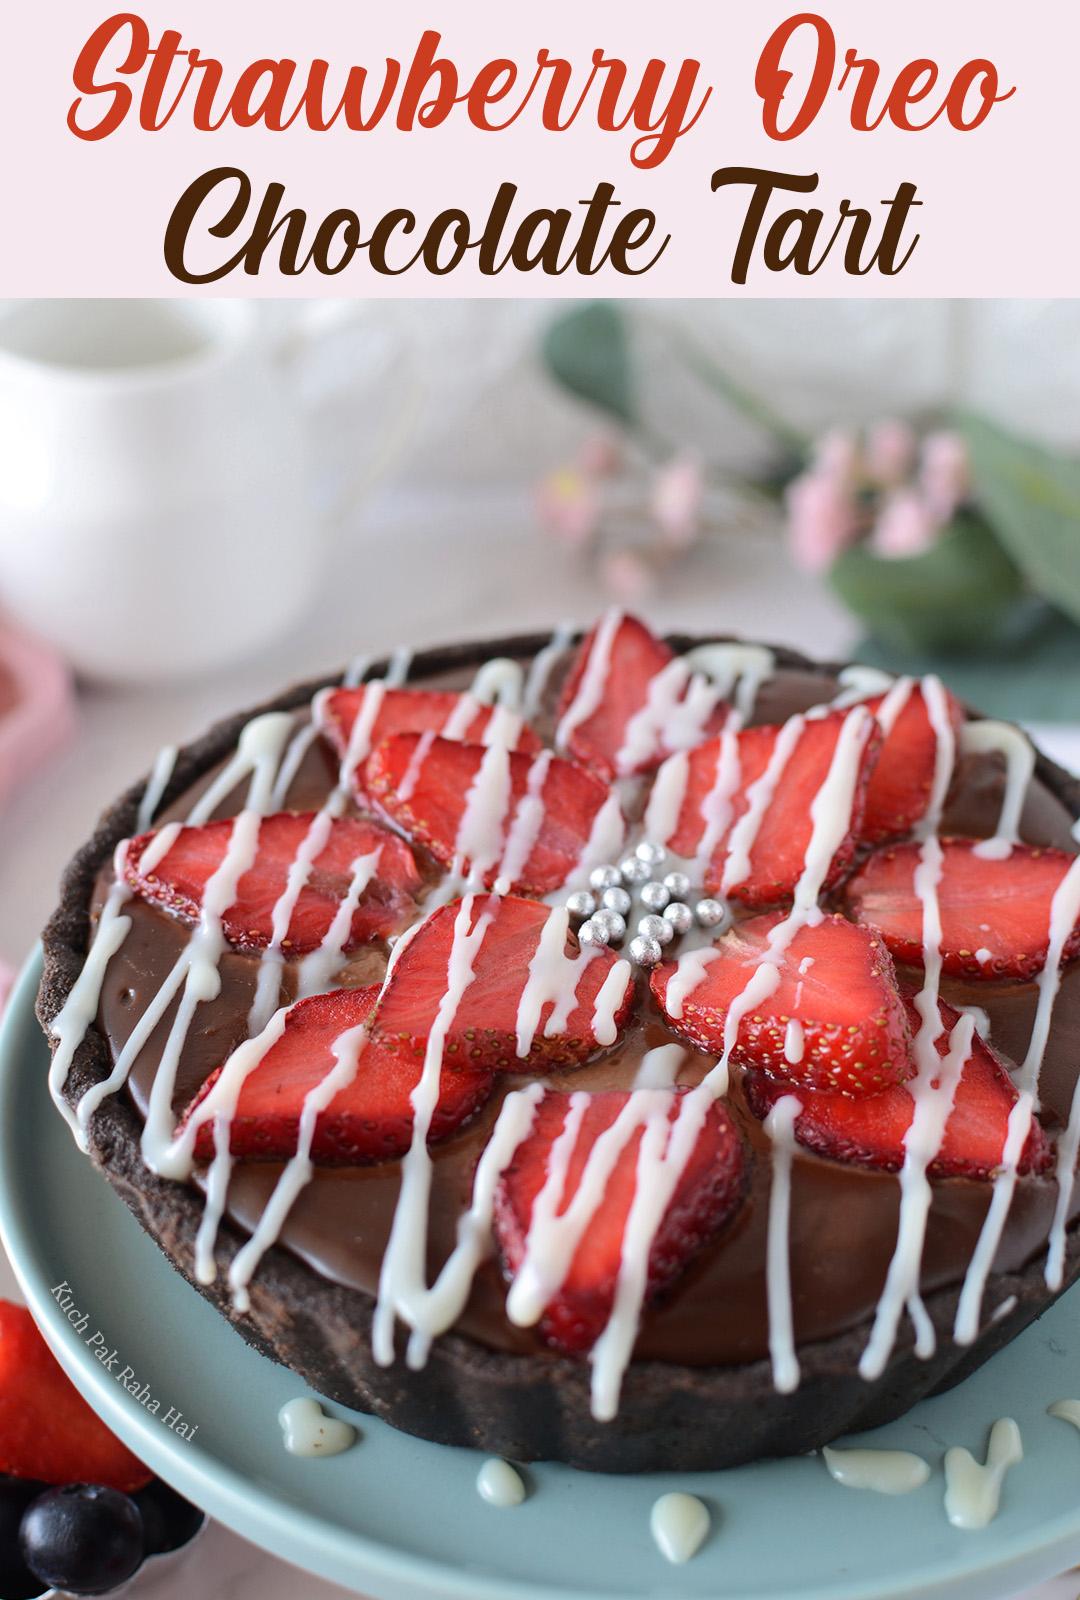 No Bake strawberry oreo chocolate tart dessert egg free valentines day special